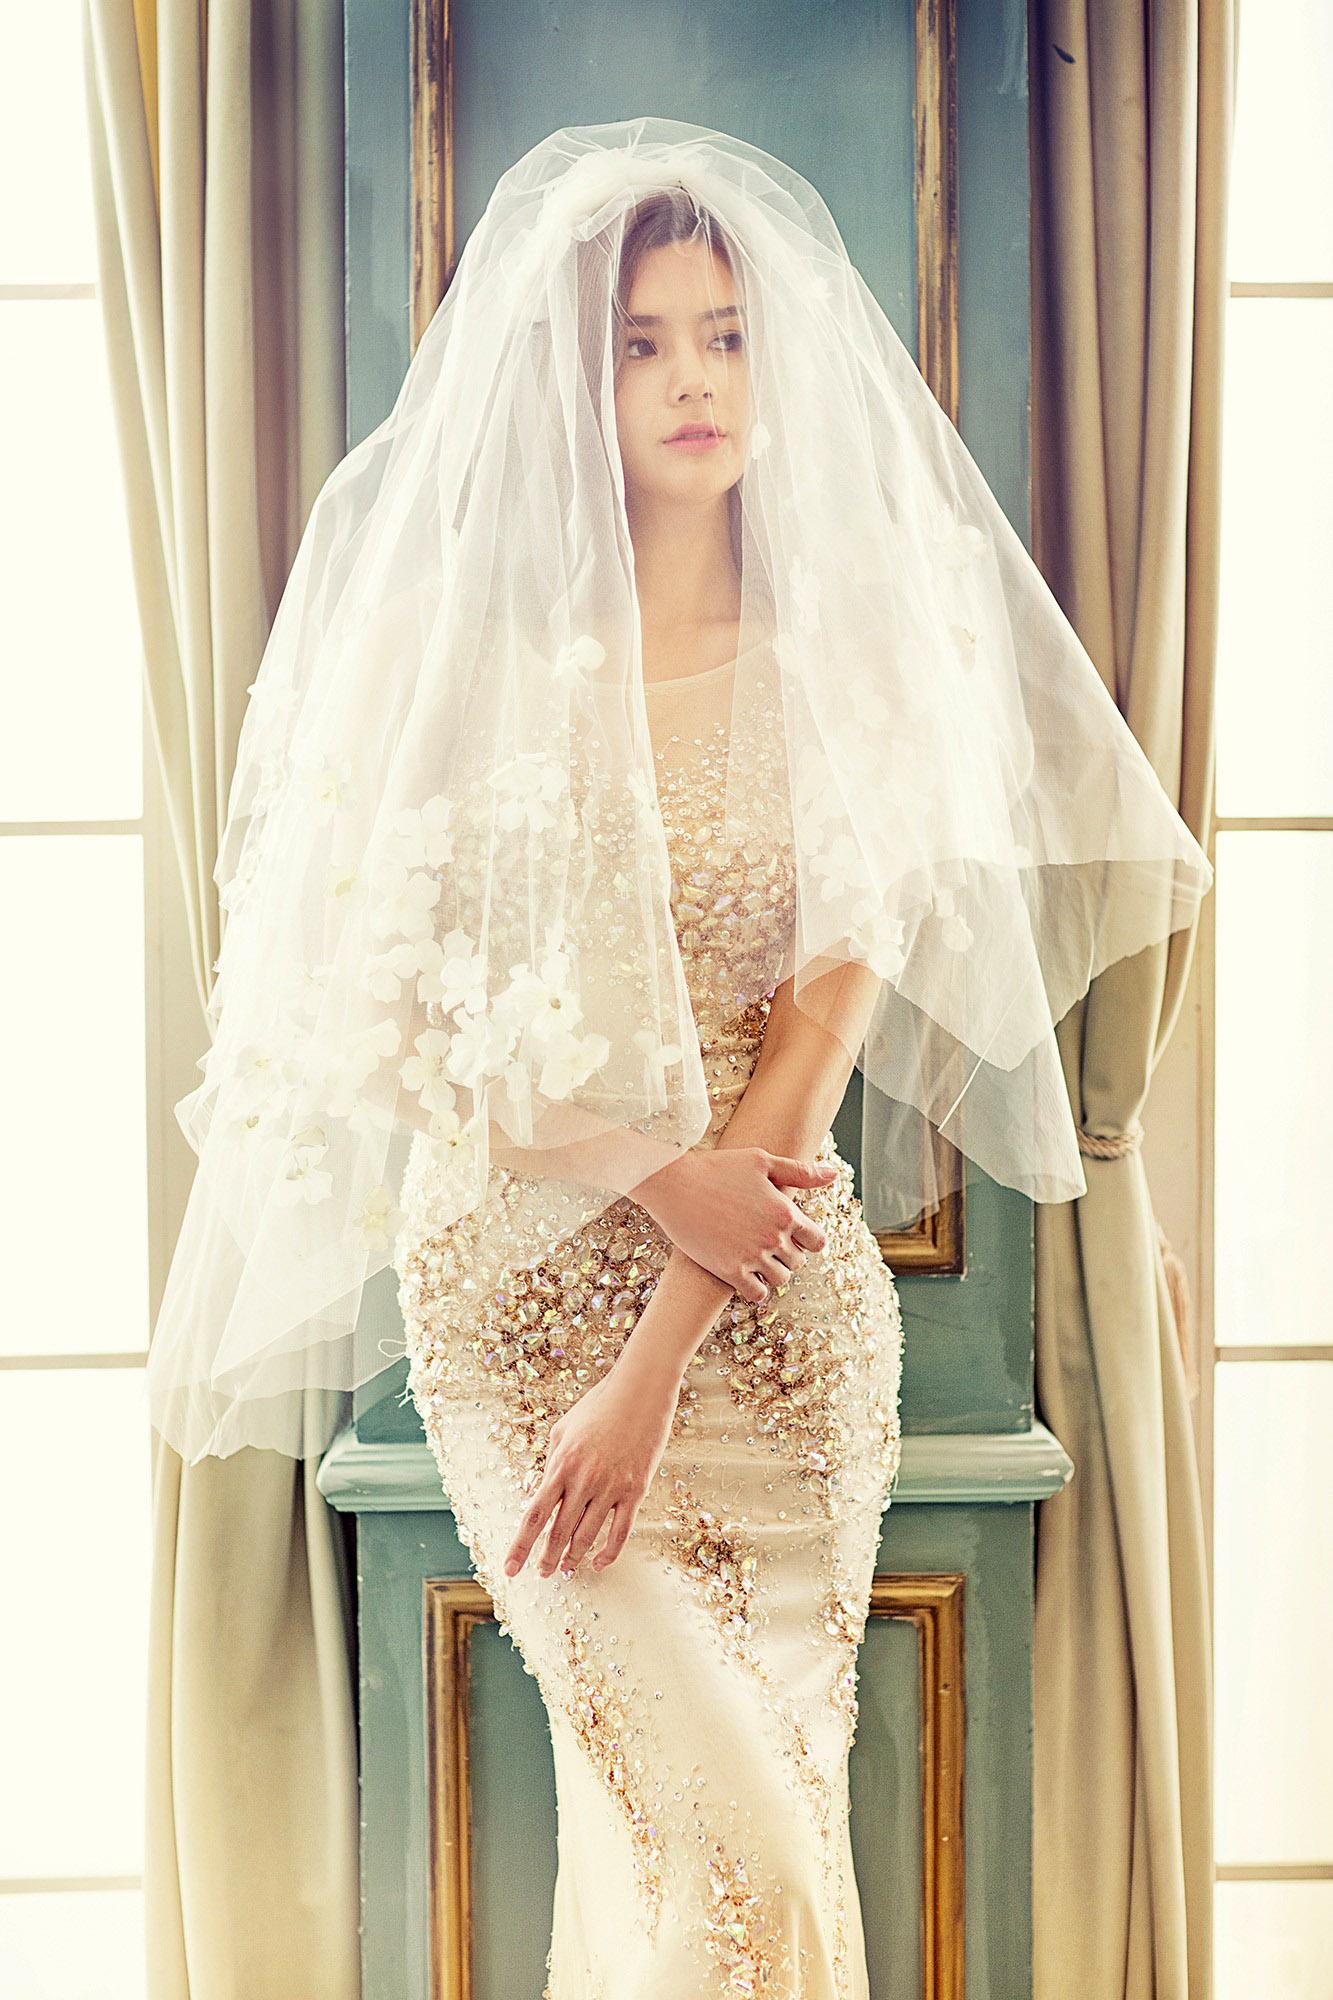 @projectfairytale: Ways to Personalize Your Wedding Day